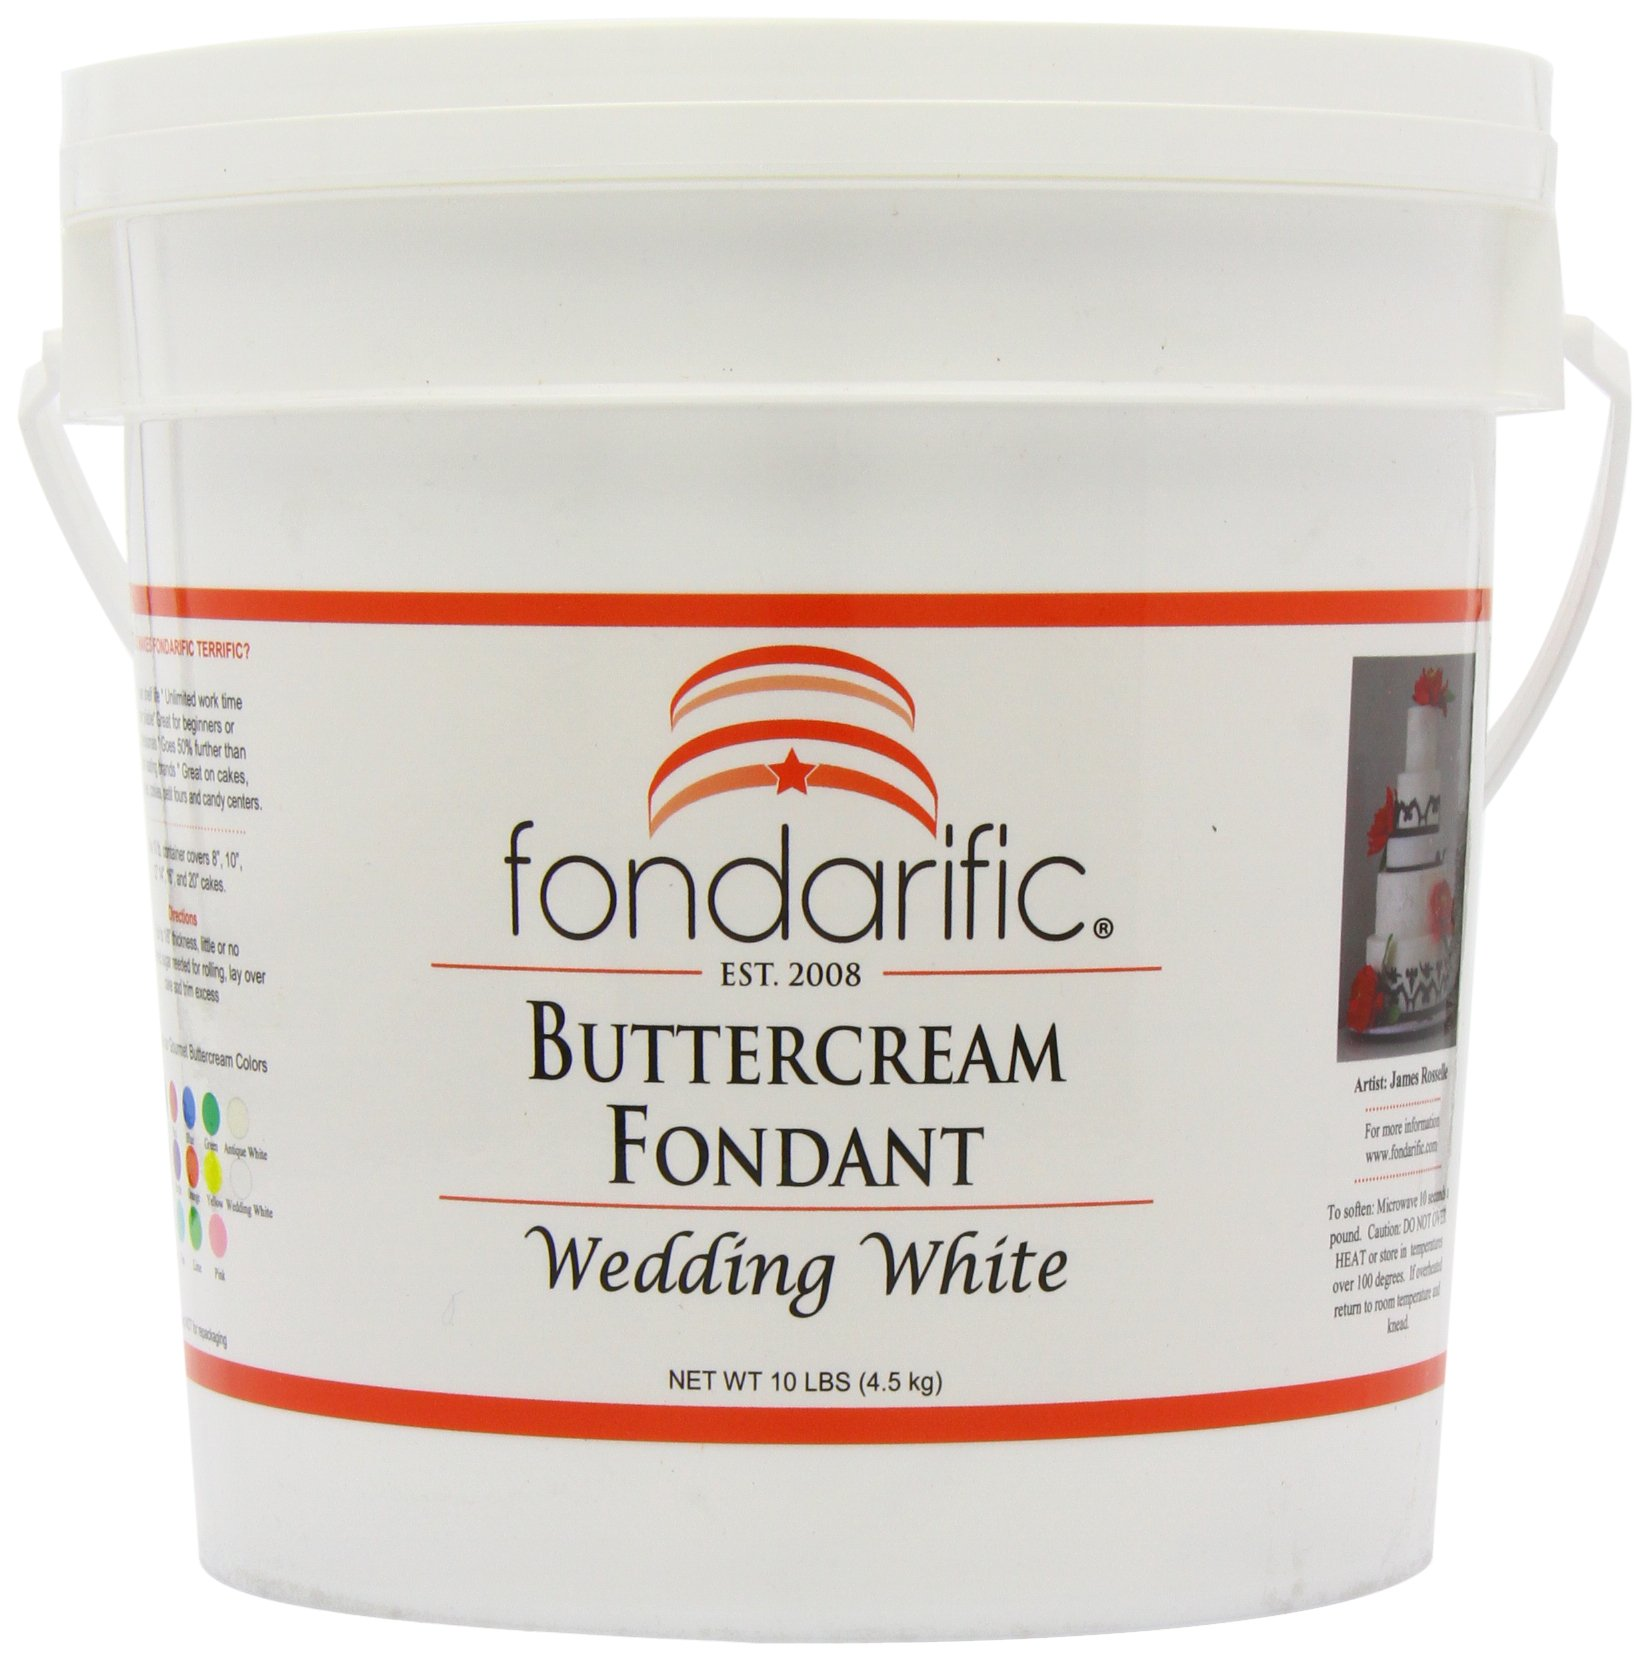 Fondarific Buttercream Wedding White Fondant, 10-Pounds